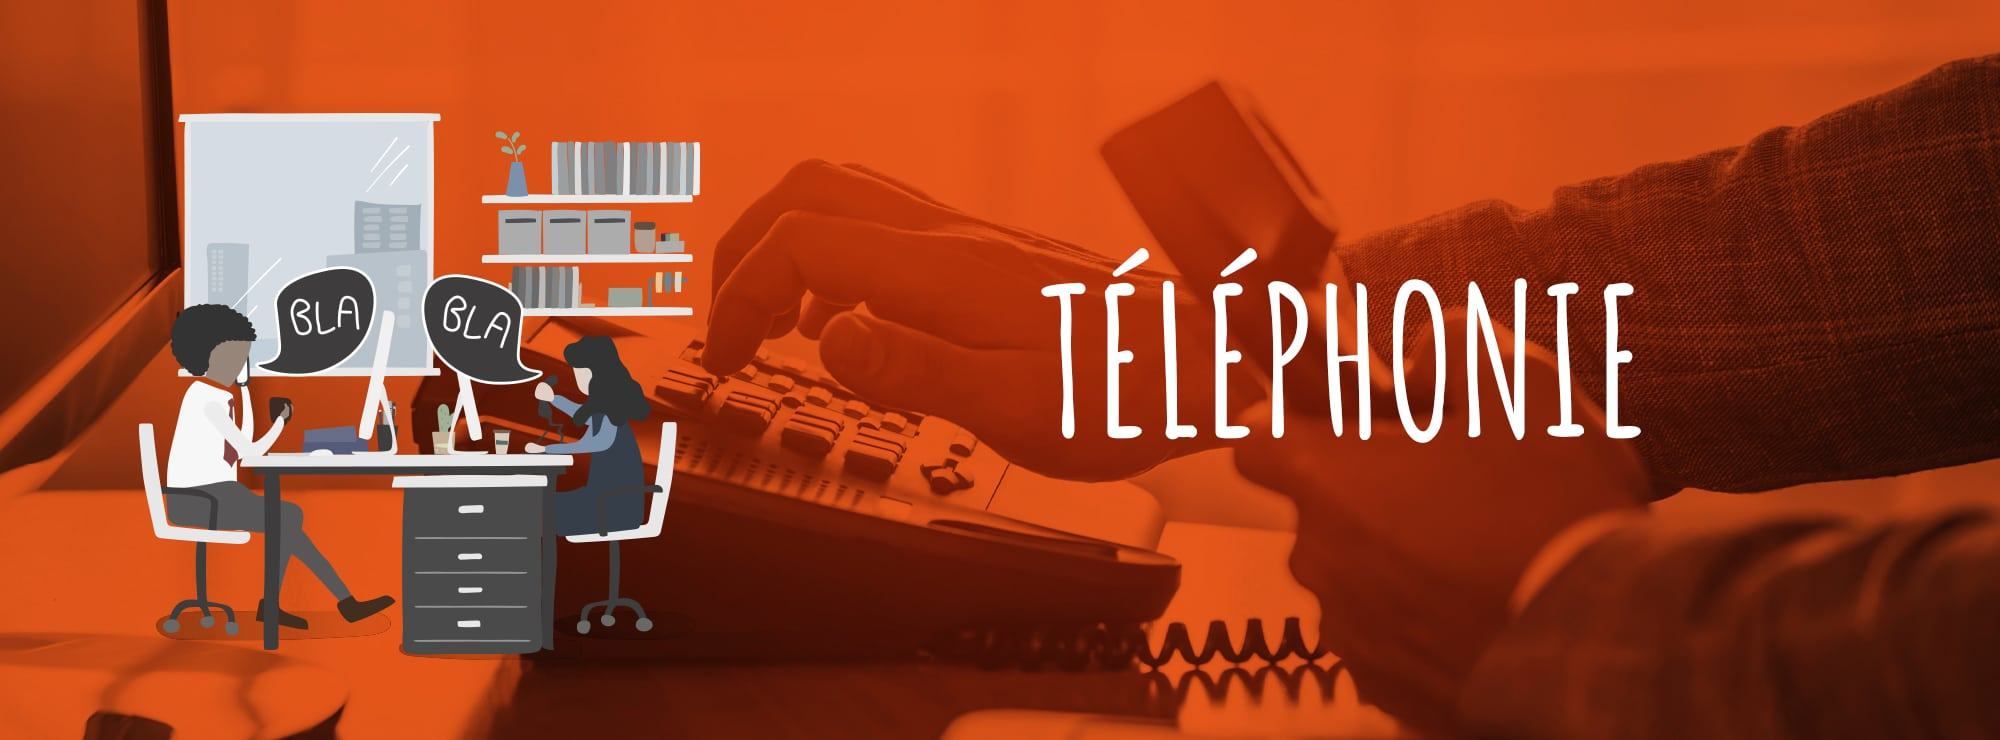 Slide-telephonie